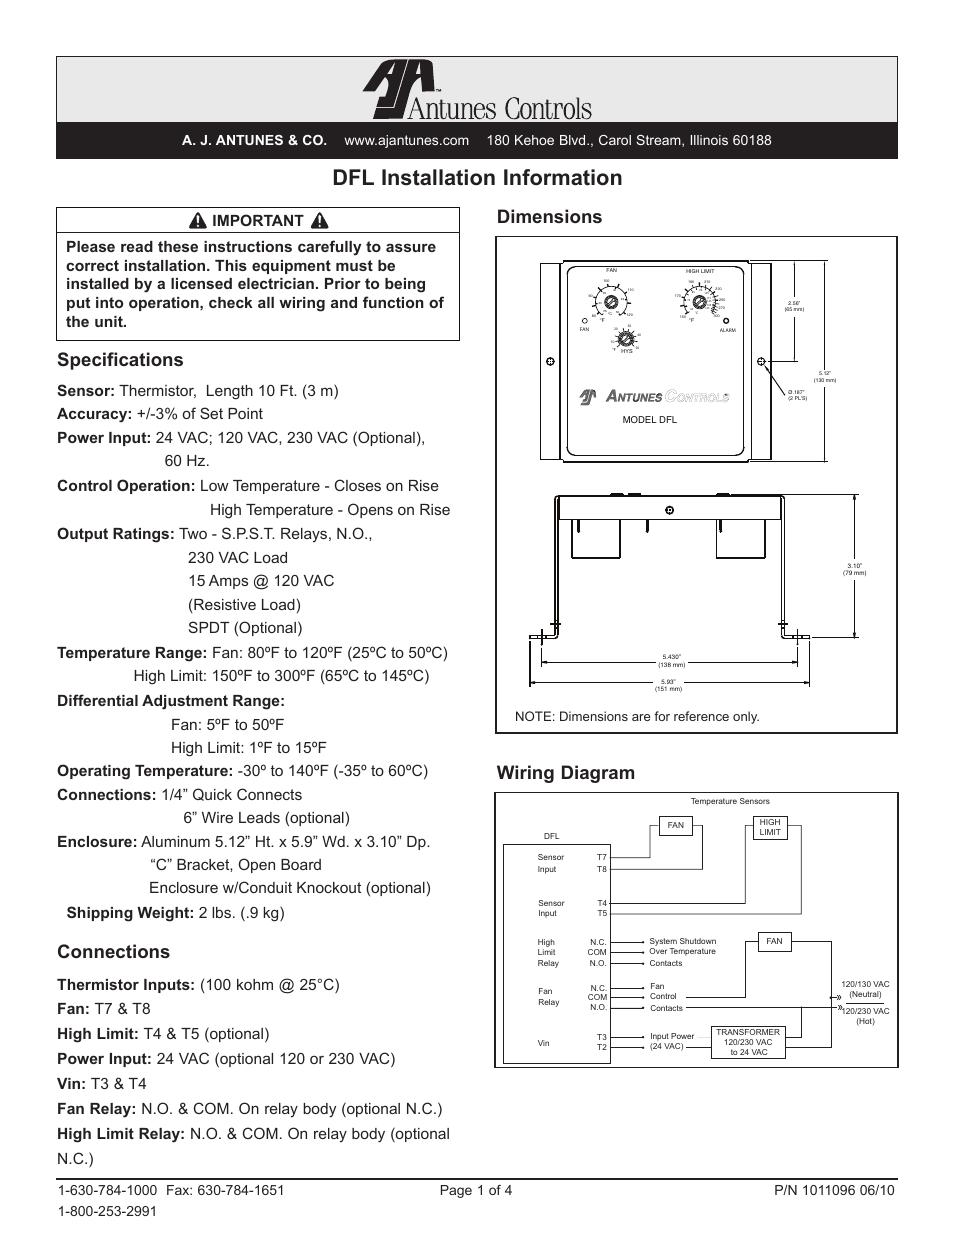 wiring diagram for lap temp 1 1 230 temp wiring diagram for lap